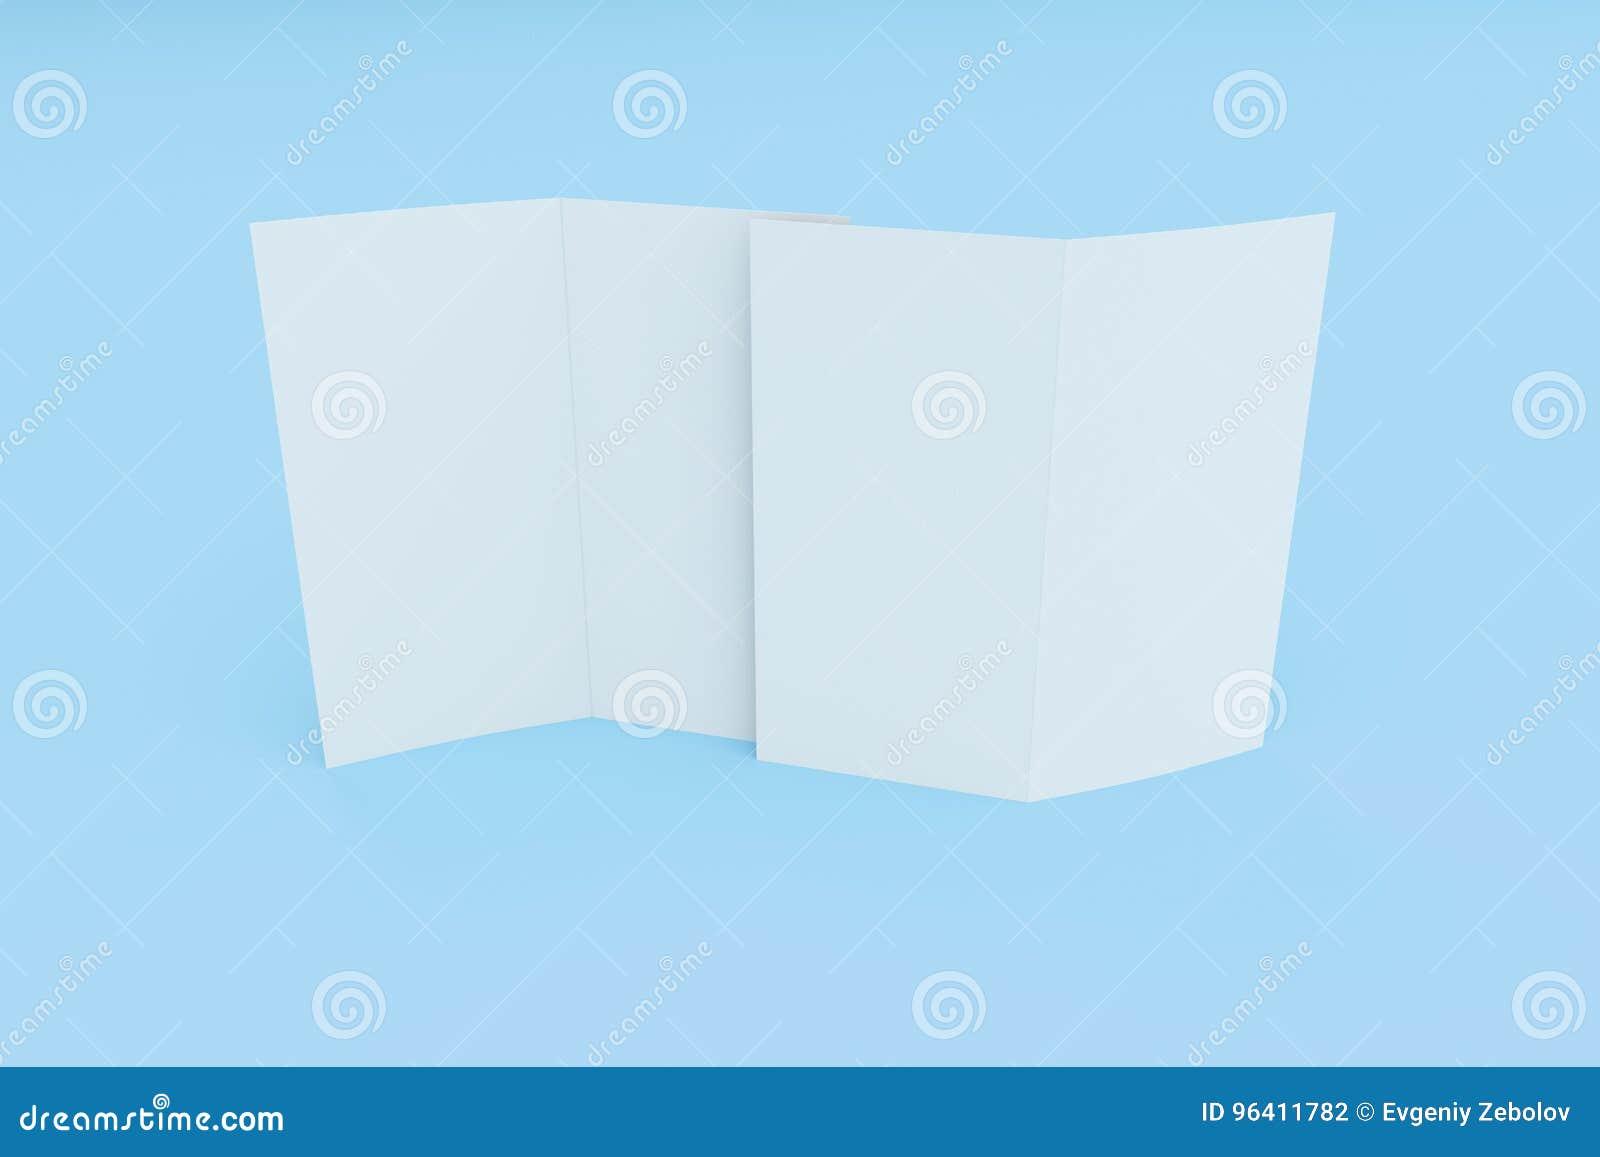 Blank White Two Fold Brochure Mockup On Blue Background Stock